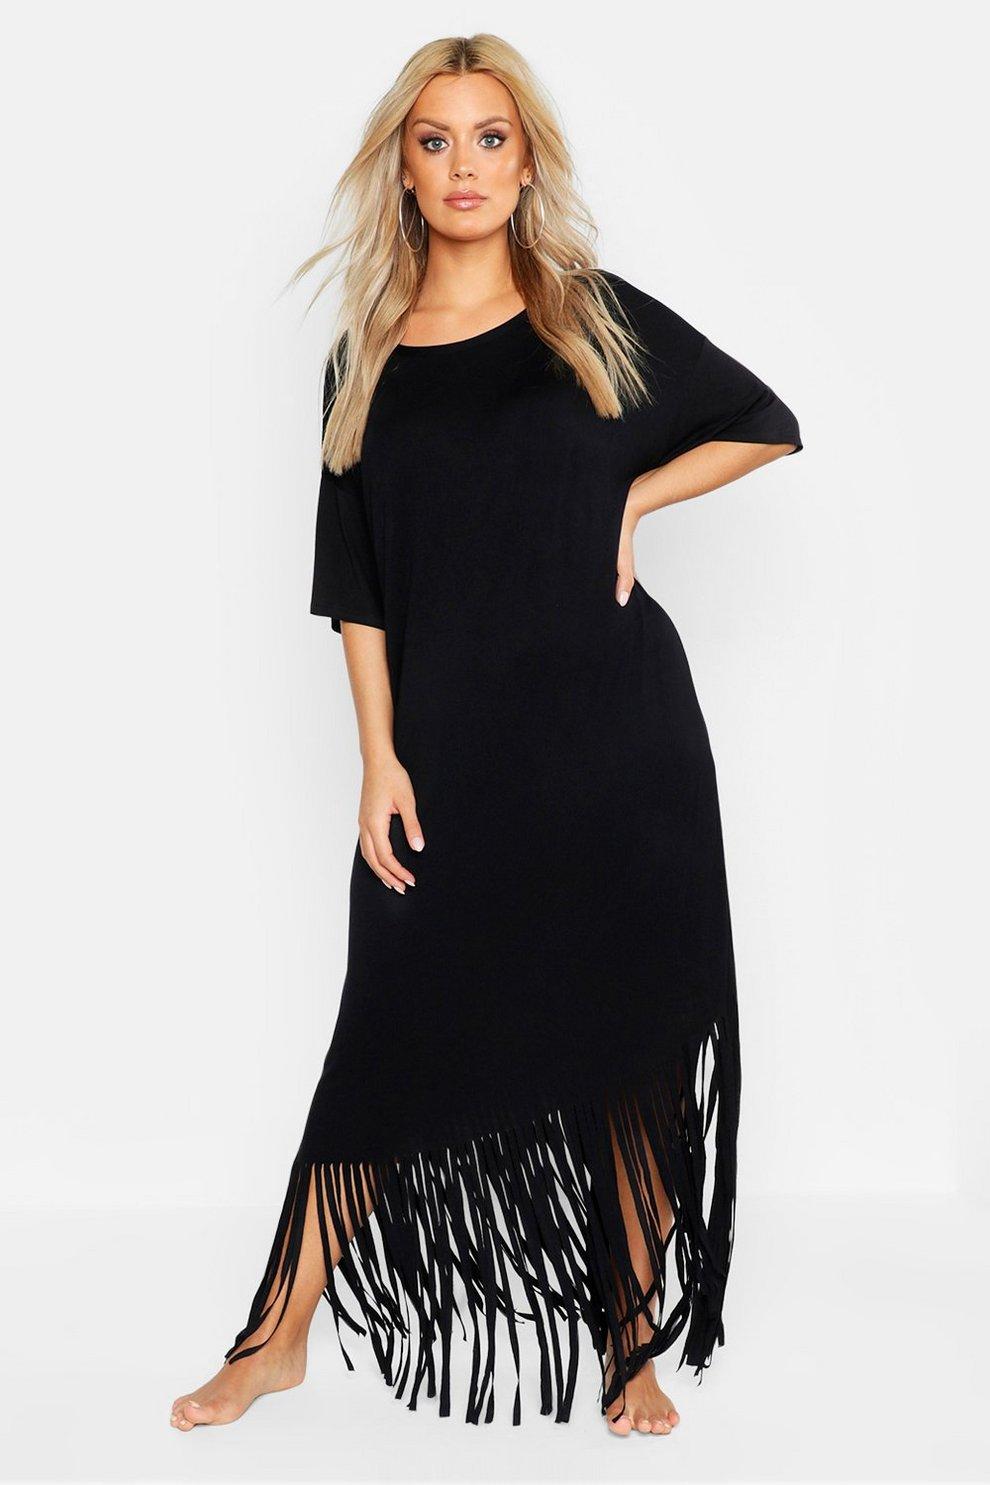 b73930a5a8 Womens Black Plus Tassel Beach Maxi Dress. Hover to zoom